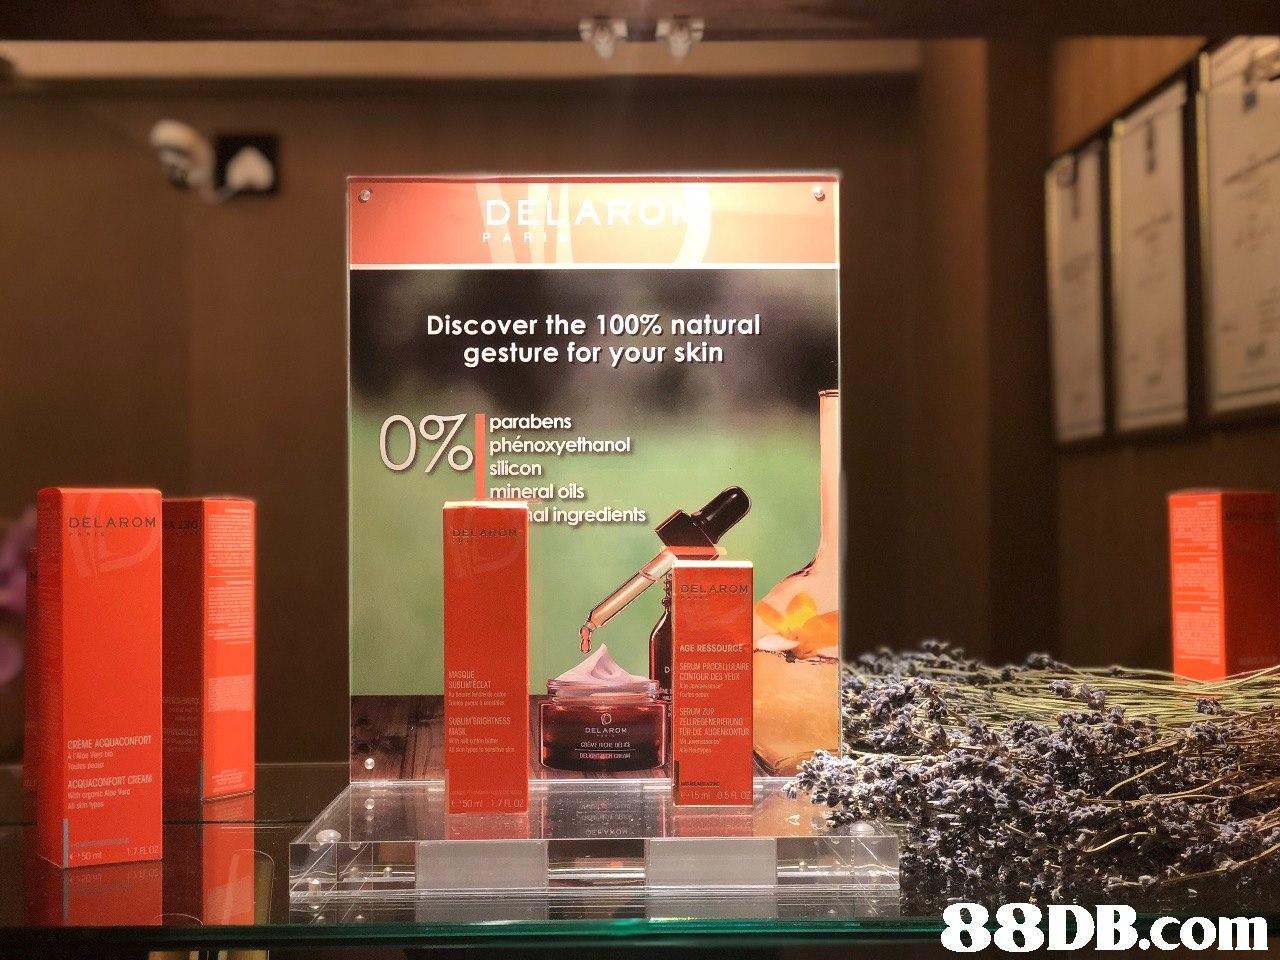 DEUARO Discover the 100% natural gesture for your skin parabens phénoxyethanol silicon mineral oils al ingredients DELAROM EL AGE RESSOURCE SERUM PROCL ARE CONTOUR DES YEUX MASQUE SUBLIMECLAT SERUIM 2UR ELLRESEERIERLNG MASK CREME ACQUACONFORT L02 88DB.com  product